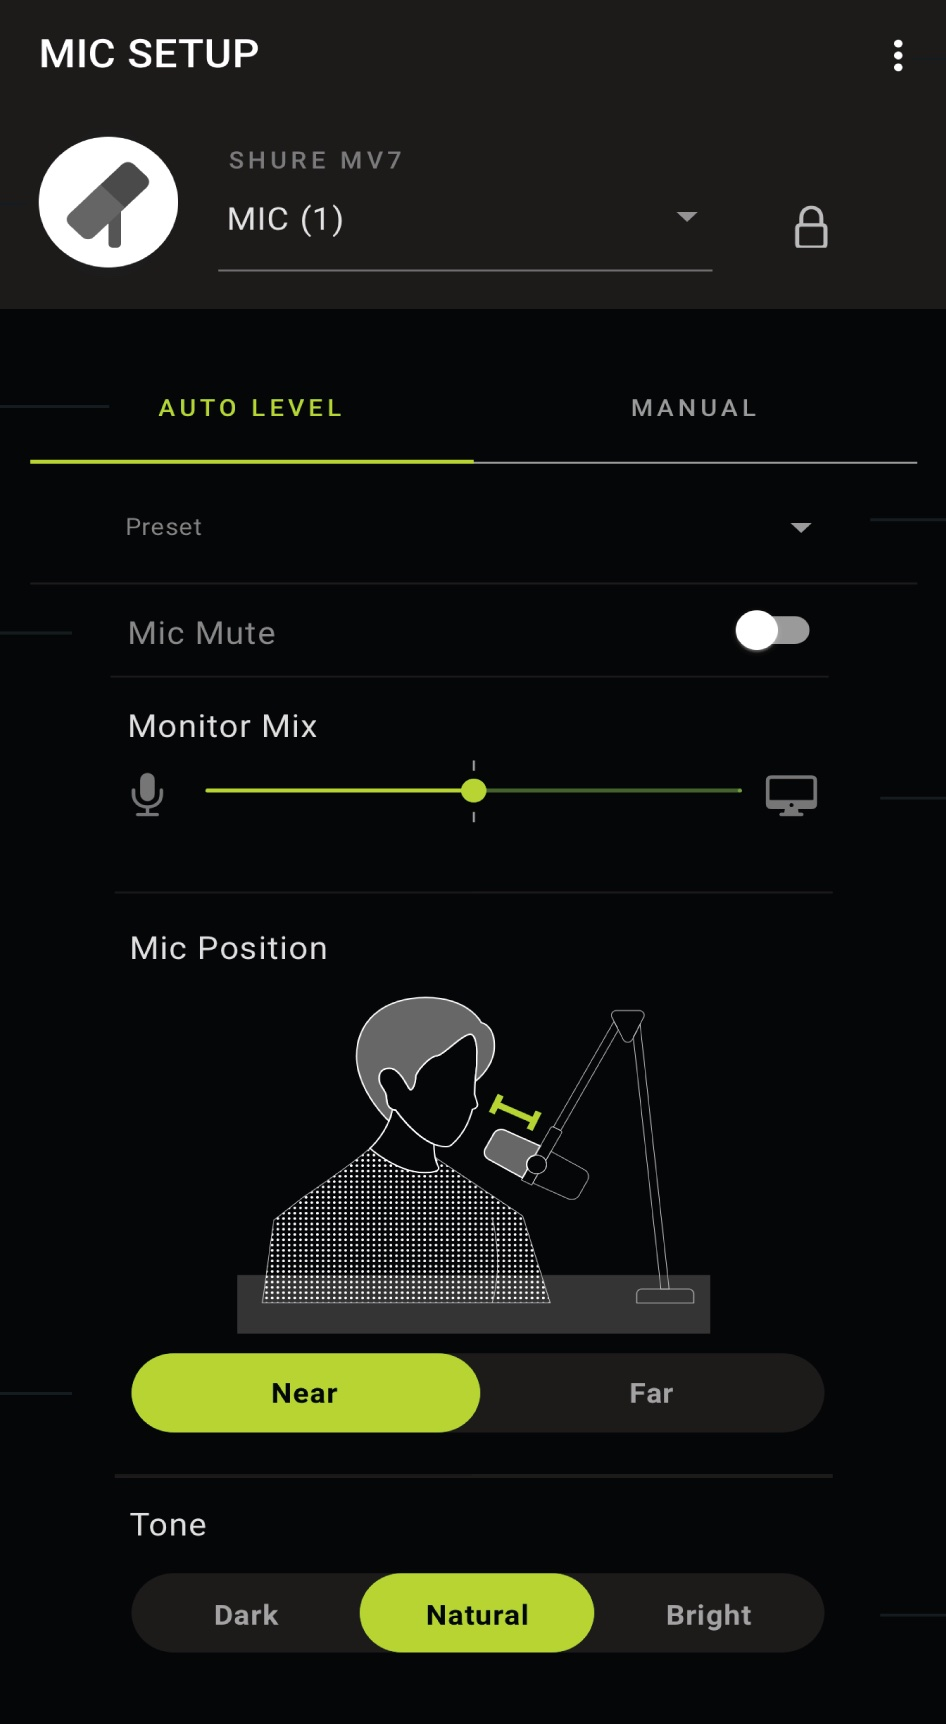 MOTIV Auto Level Mode